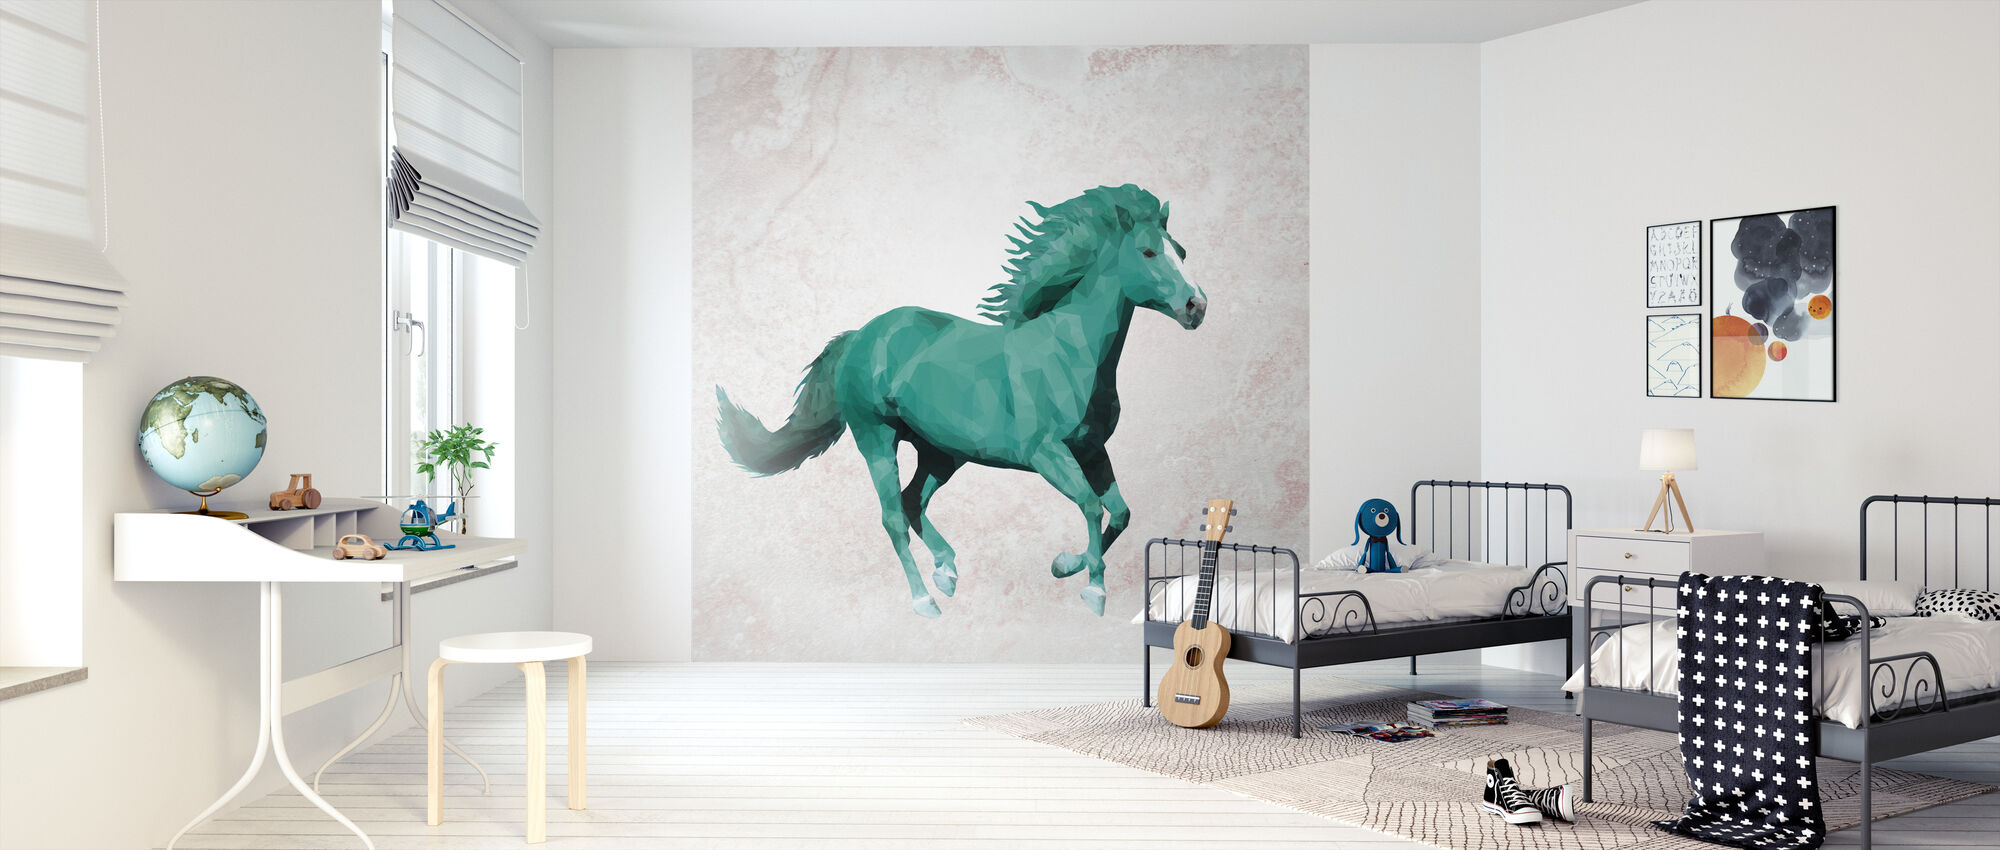 Polygon Horsy Crazy - Wallpaper - Kids Room